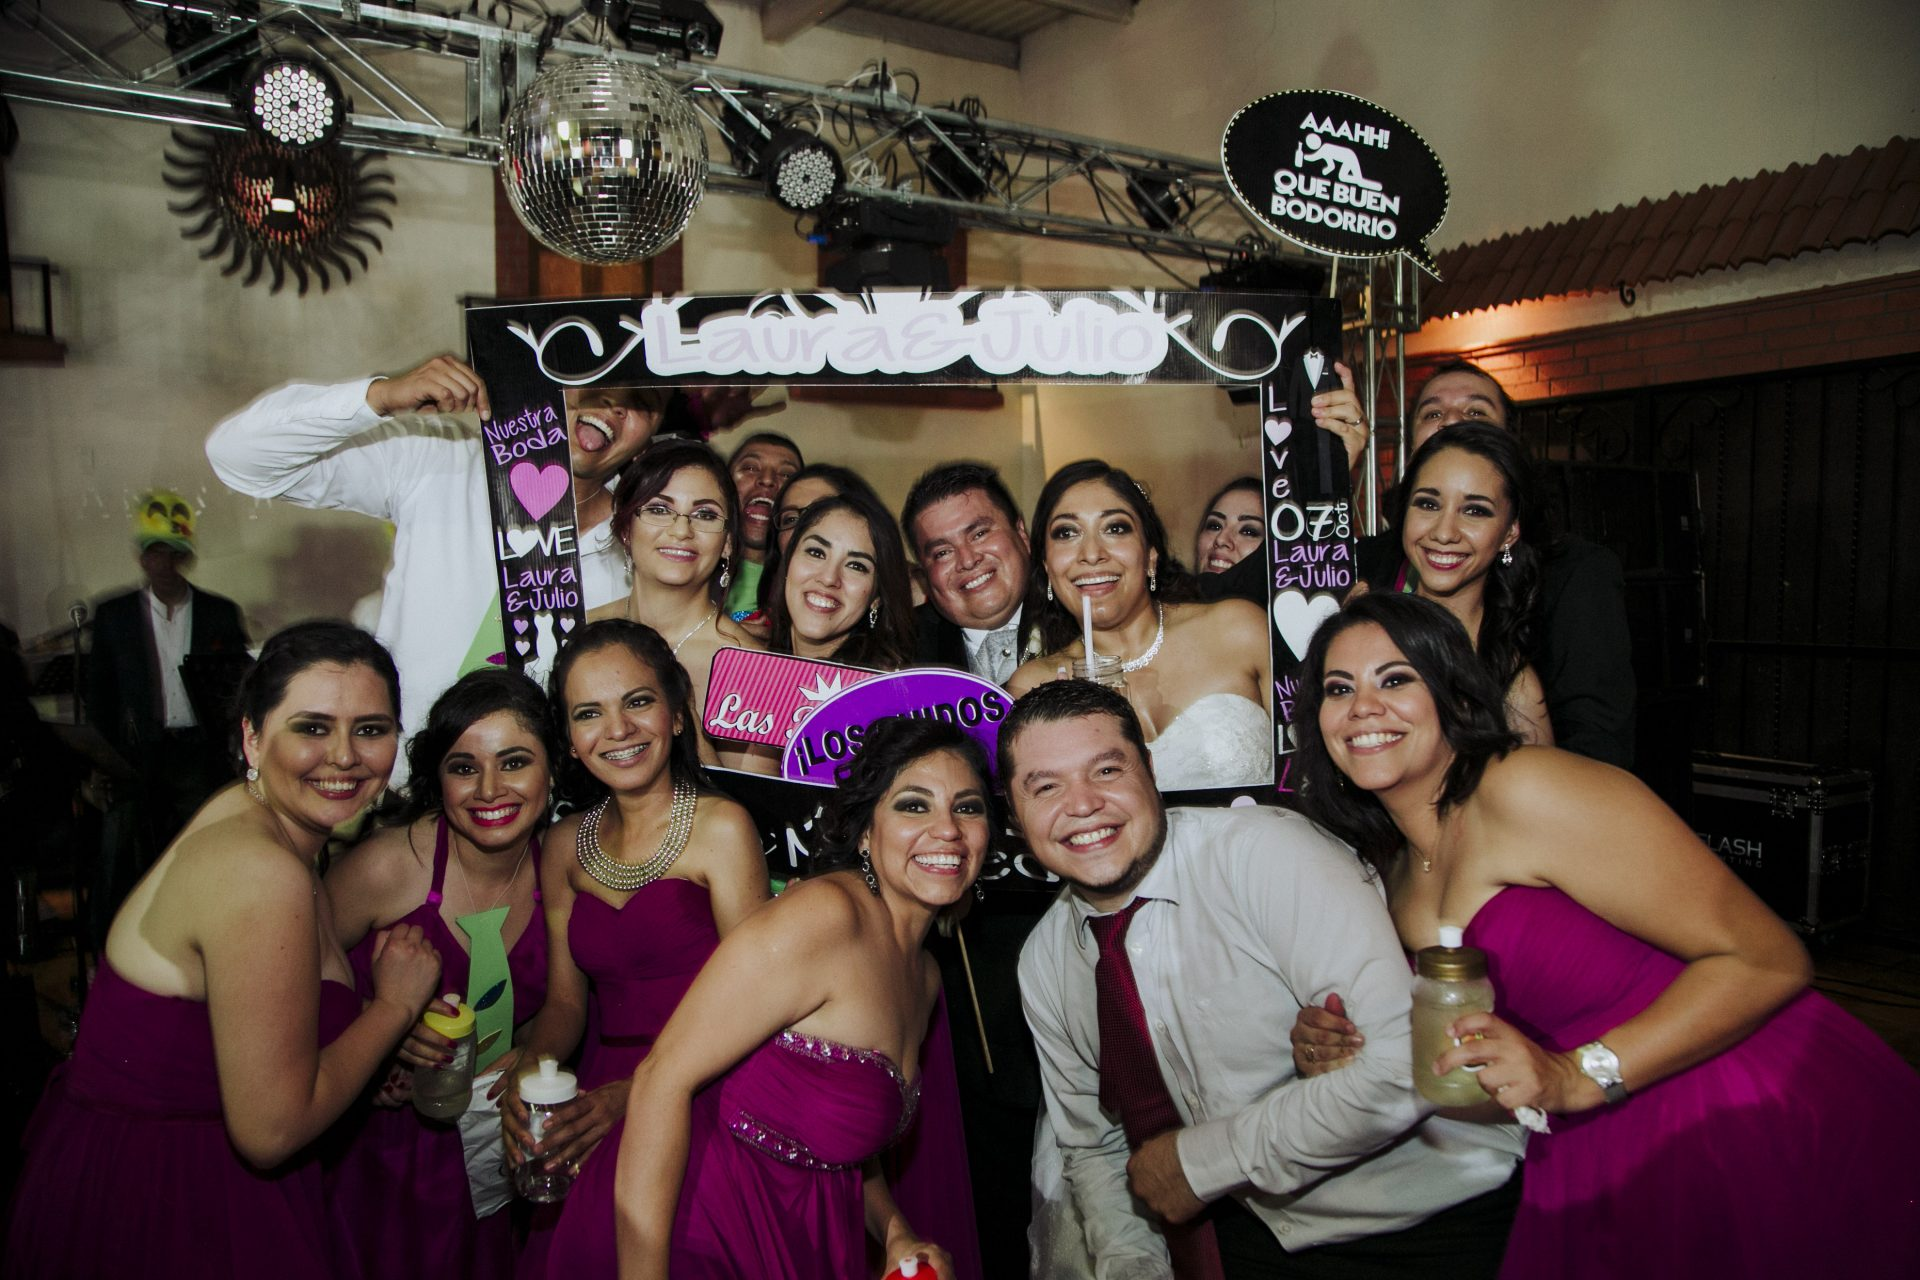 fotografo_profesional_zacatecas_chihuahua_bodas_xv_mexico-66